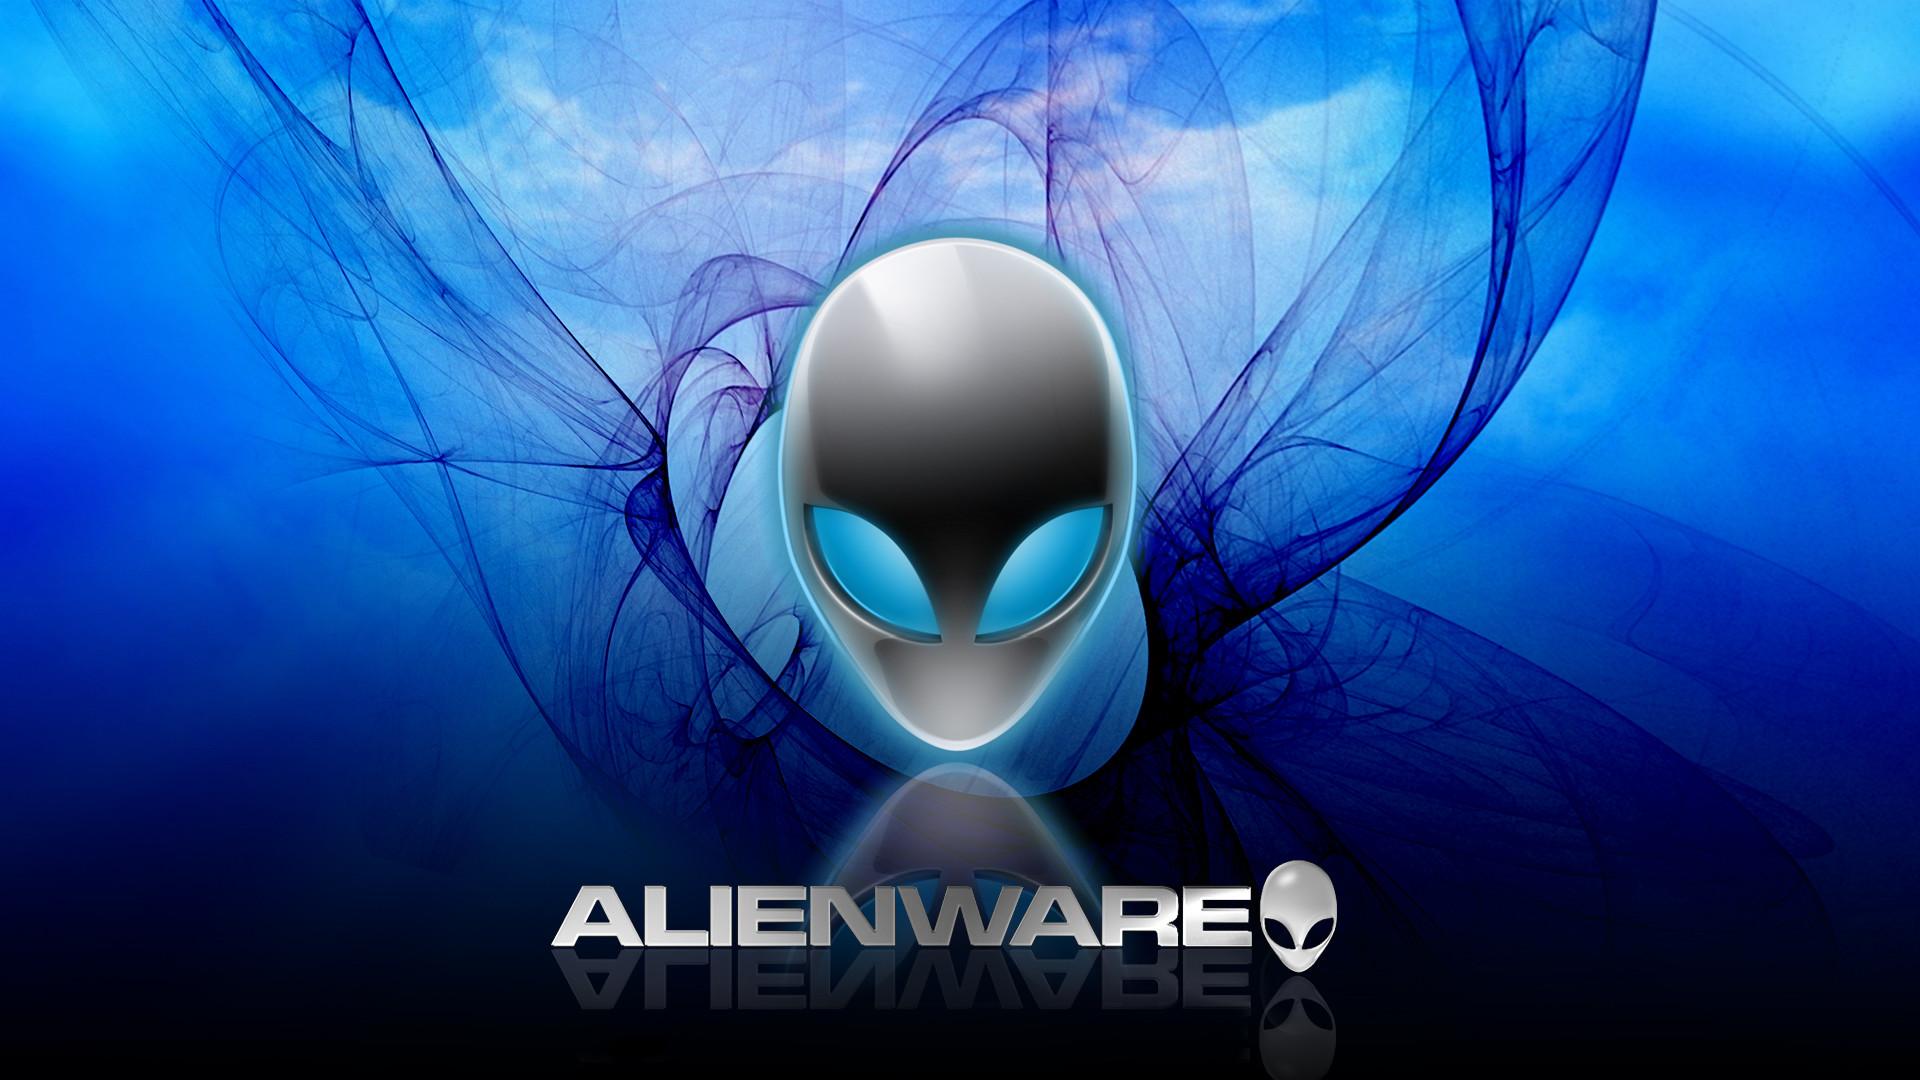 Alienware wallpapers for windows 7 wallpapersafari - 3840x2160 Alienware Wallpaper 3840 X 2160 Wallpapersafari